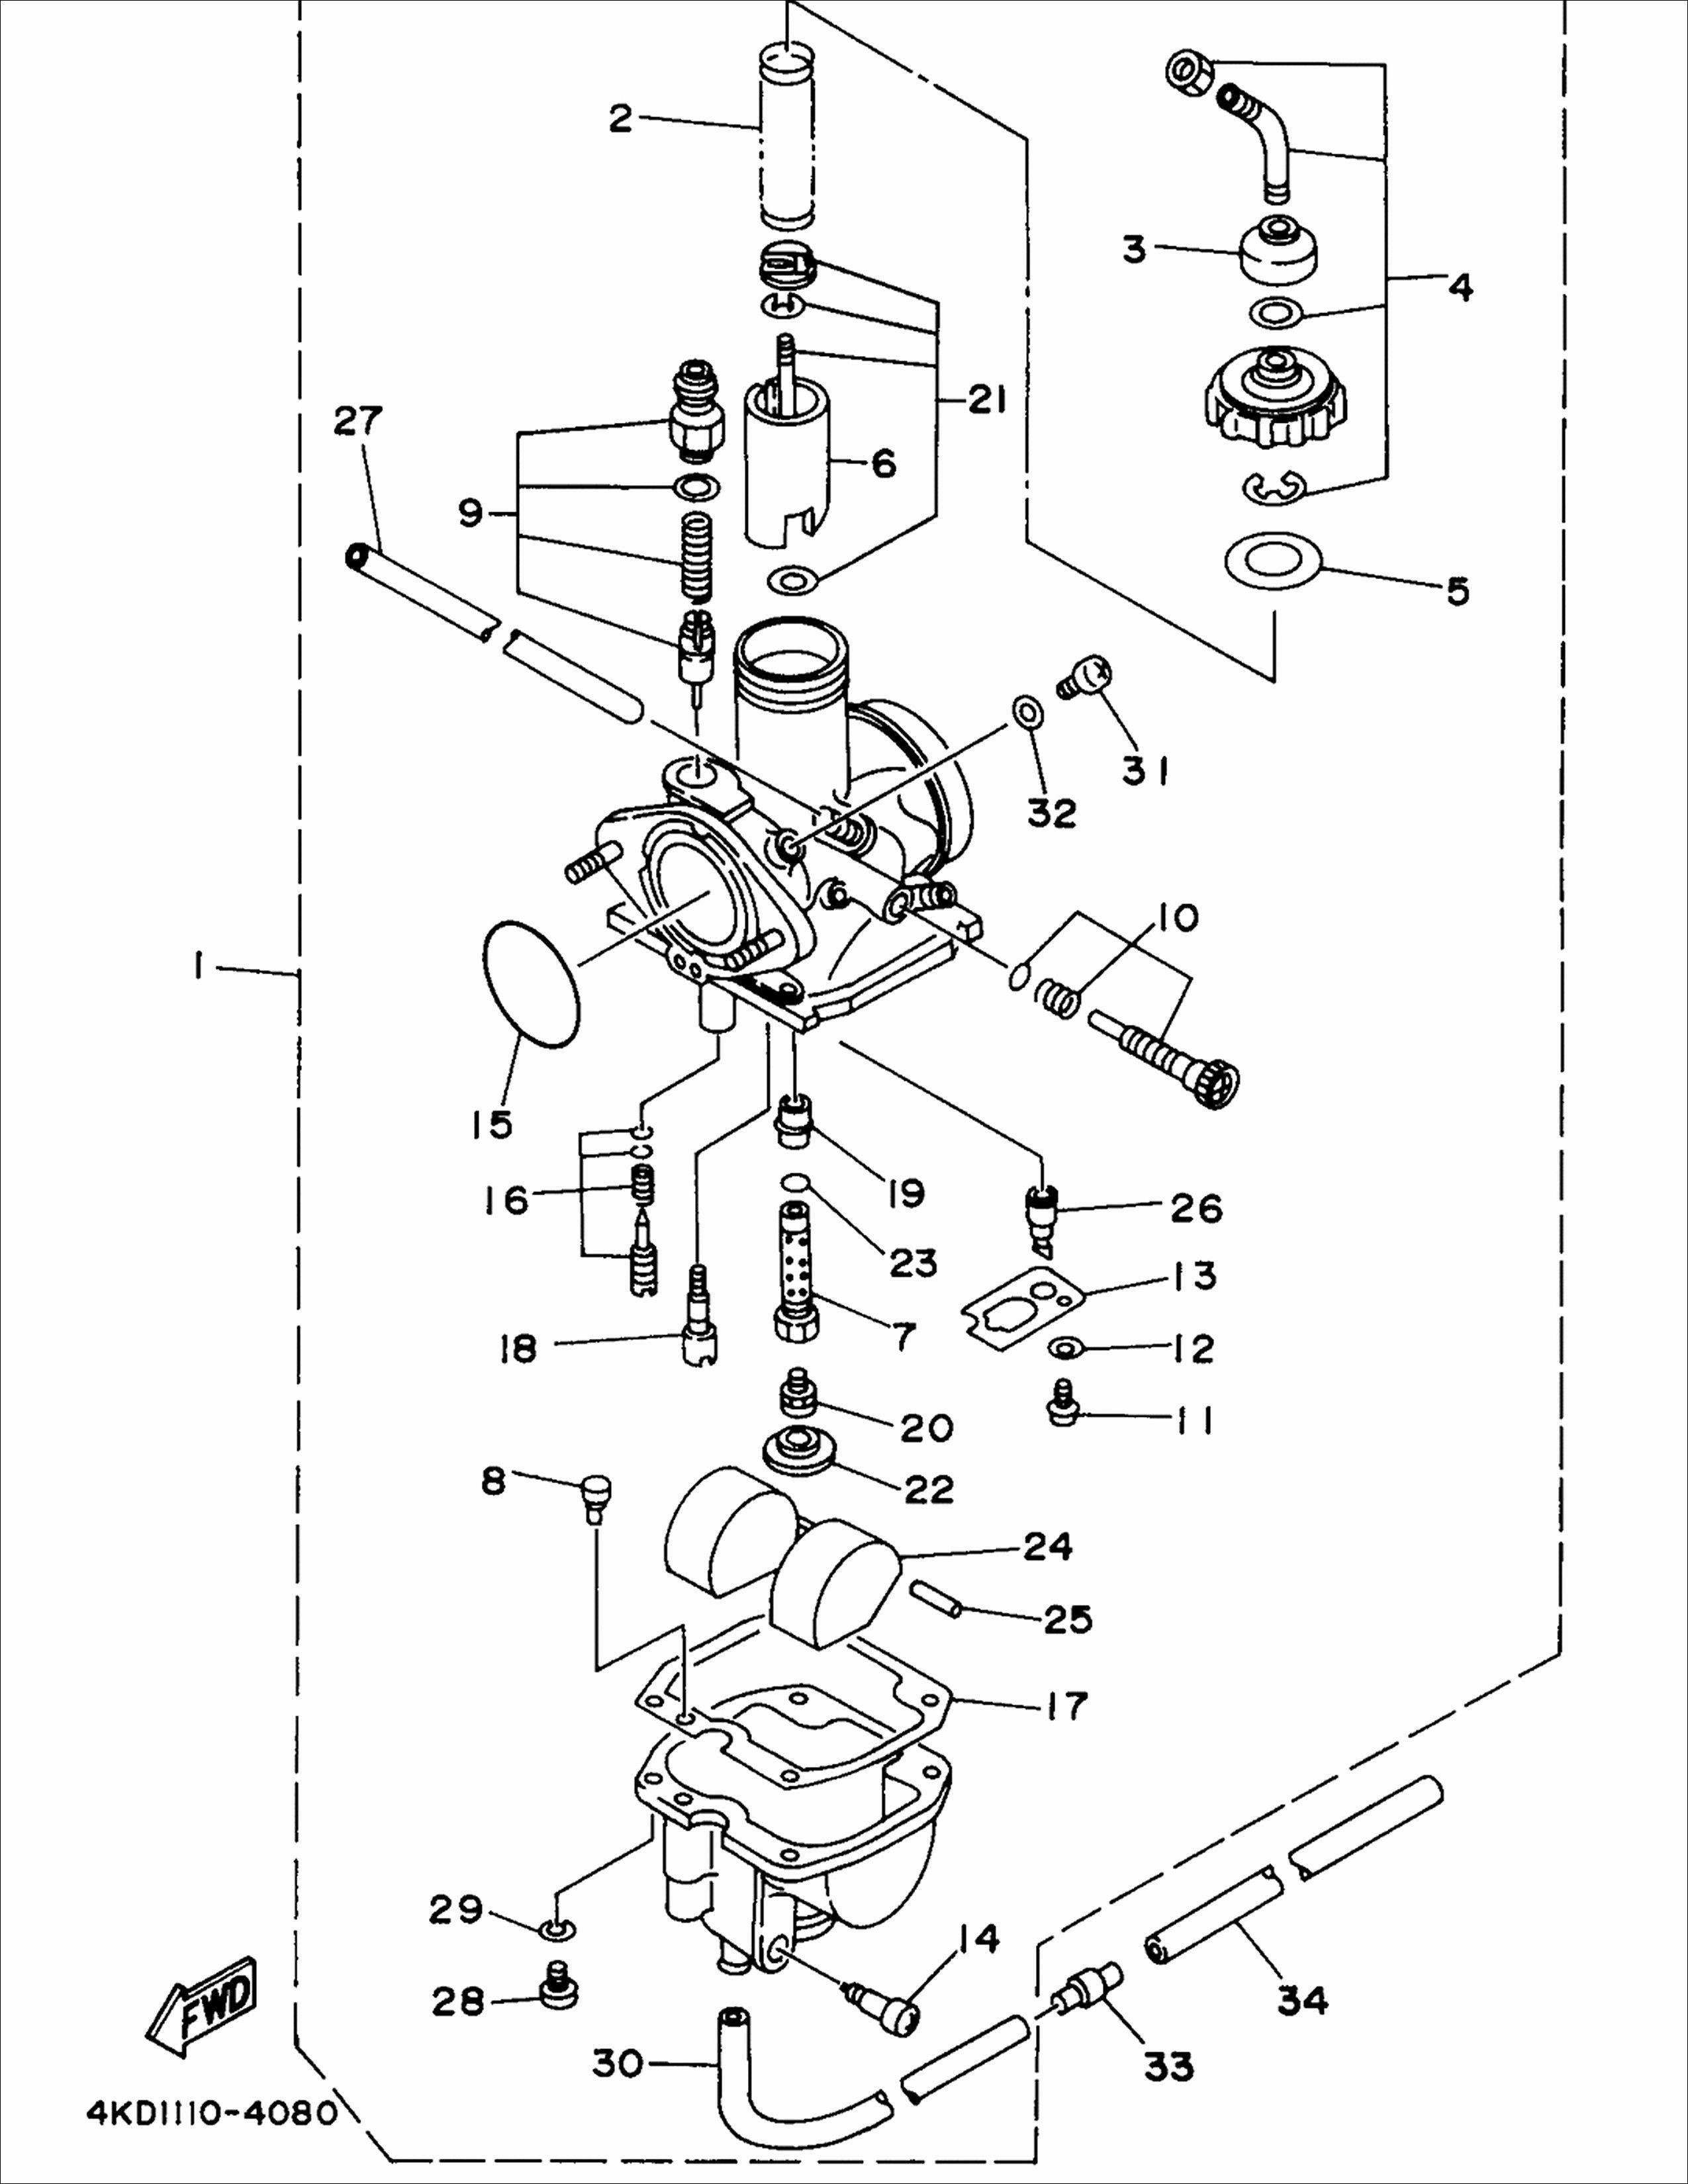 [DIAGRAM] 1985 Mustang Electric Choke Wiring Diagram